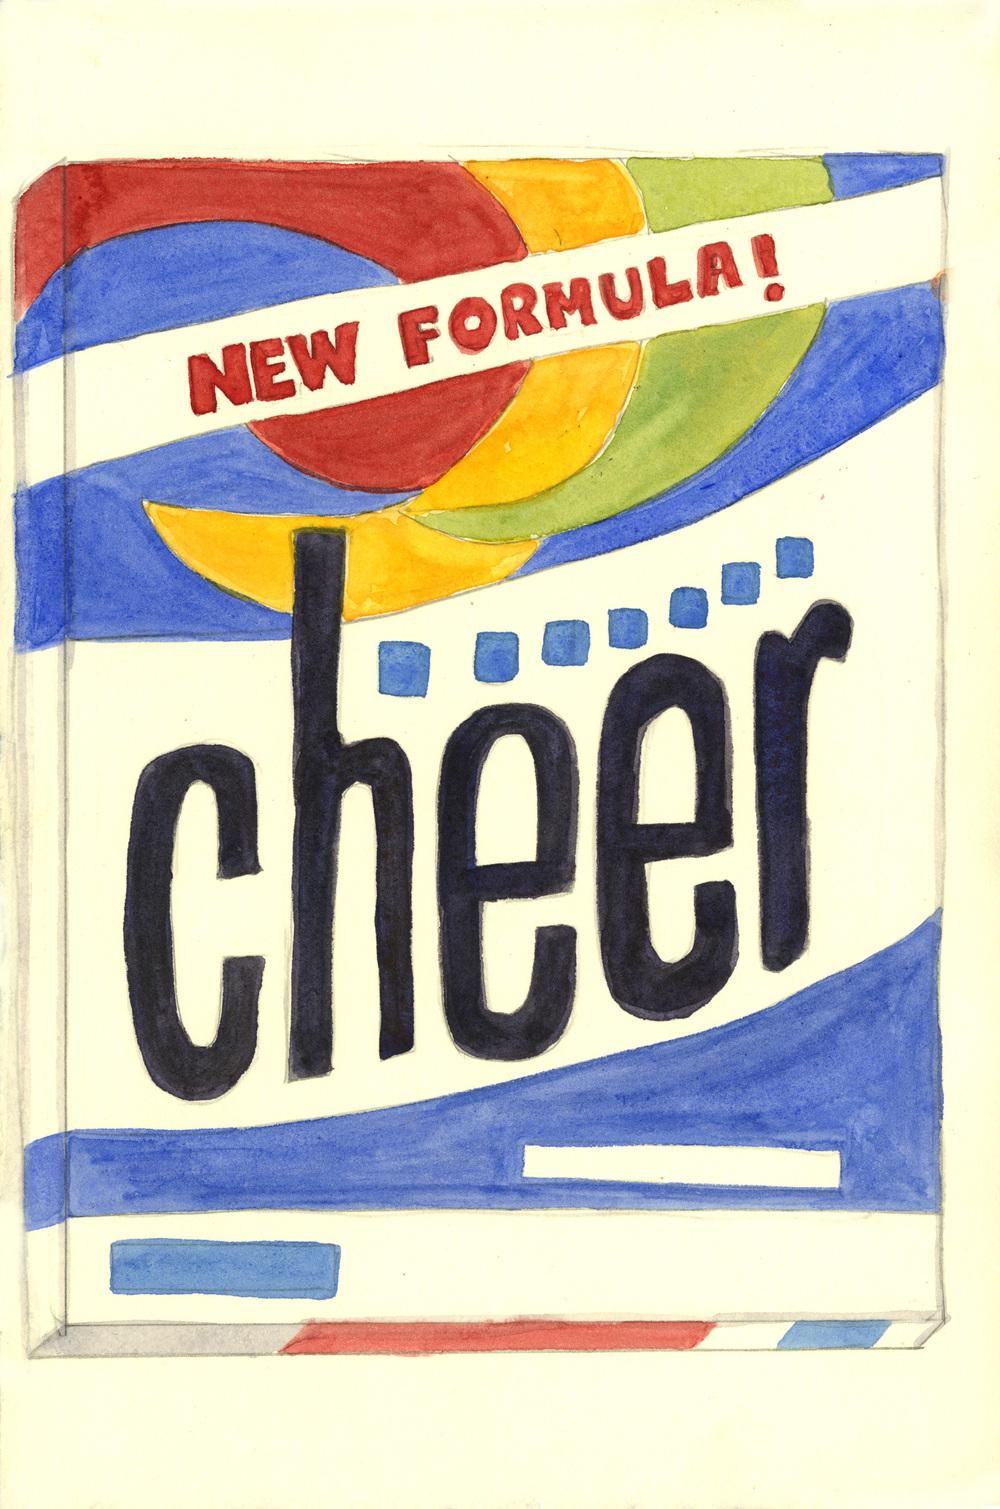 Cheer, 2014